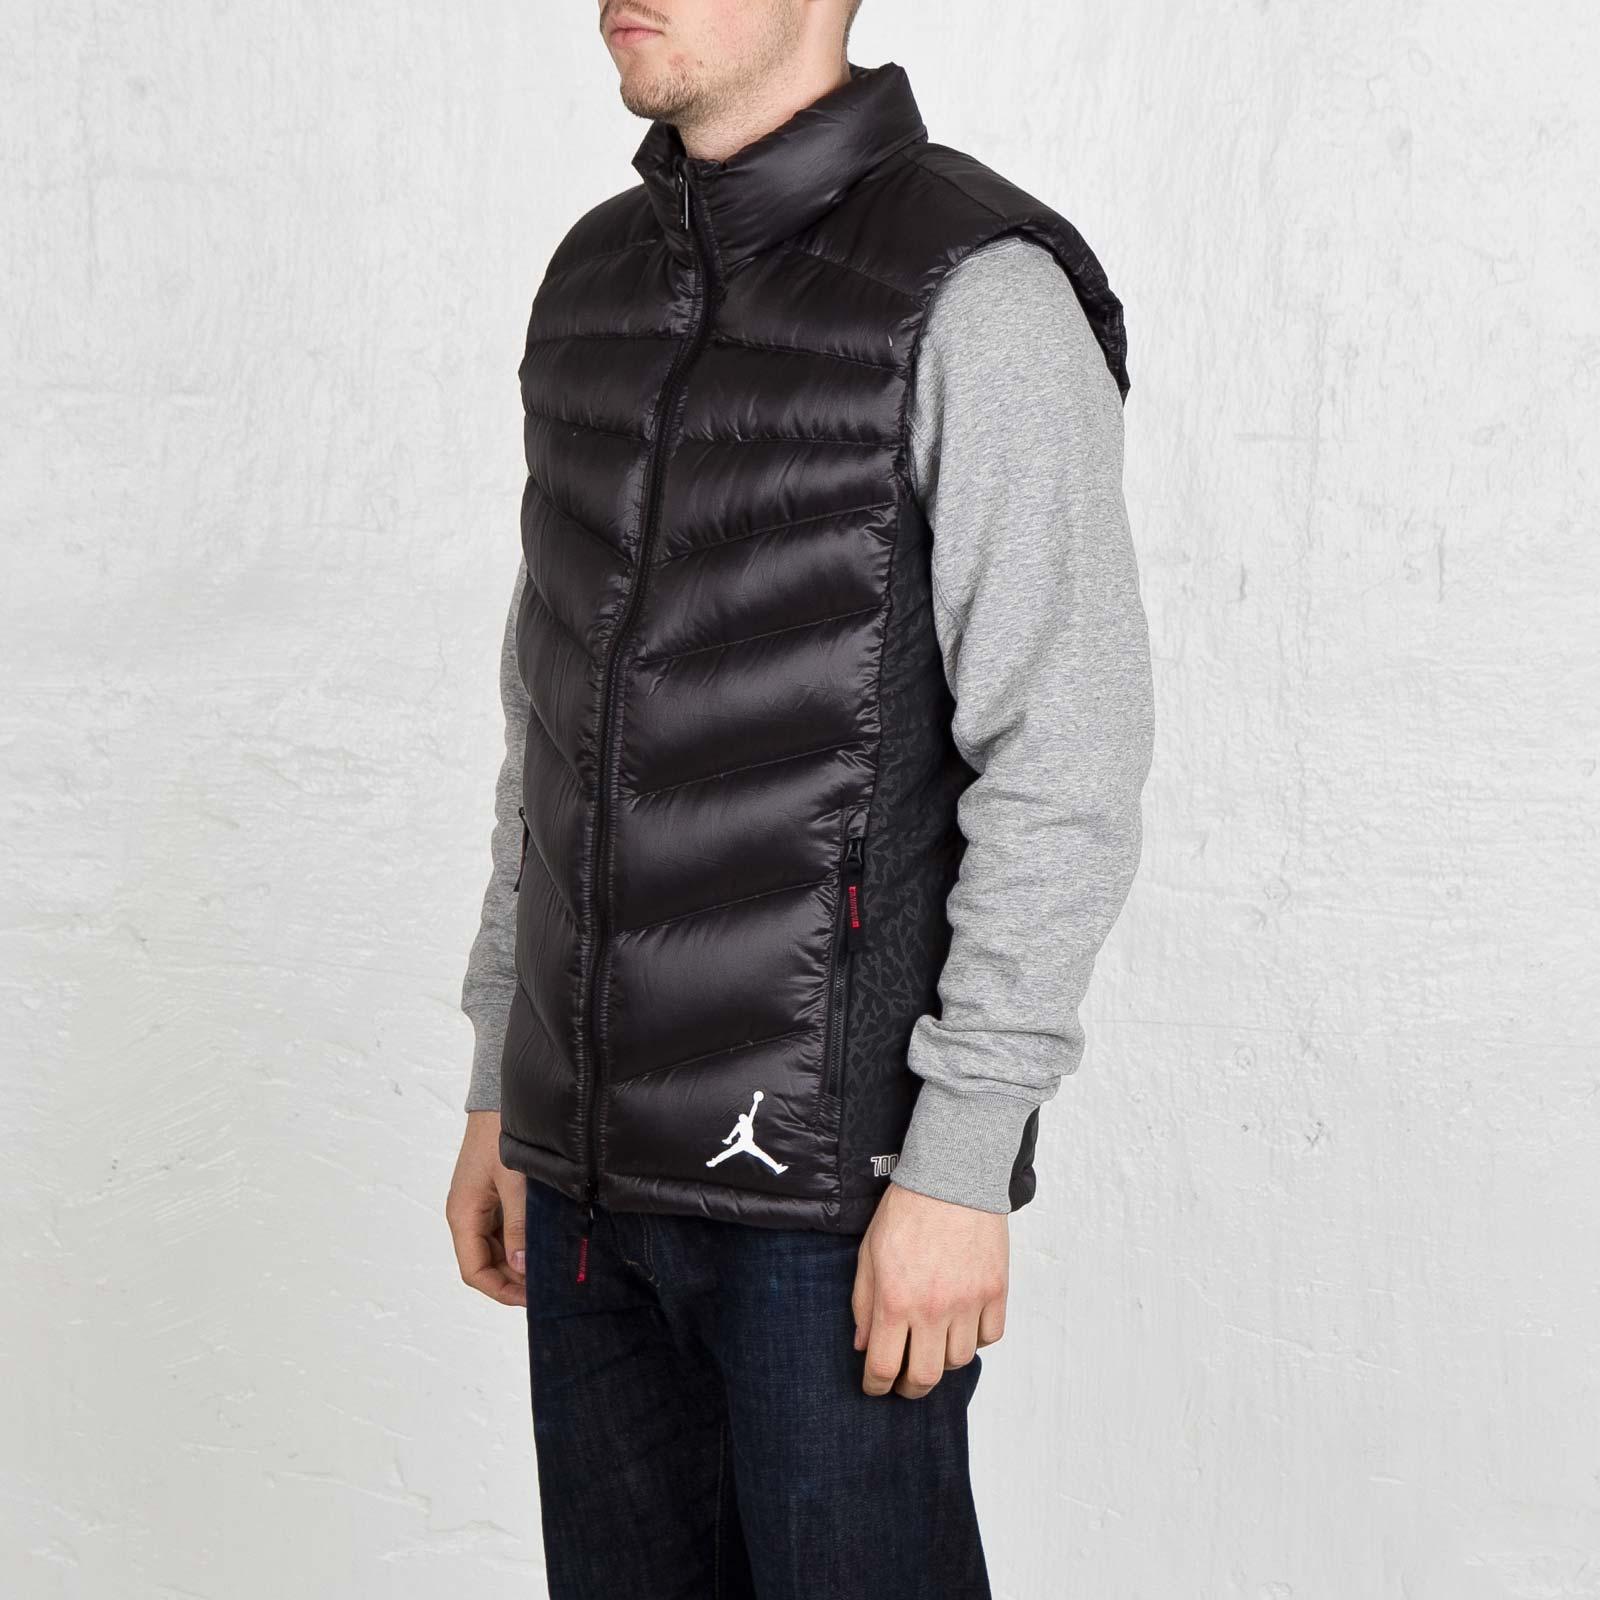 27ca0fffa1 Jordan Brand Hyperply Vest - 623481-010 - Sneakersnstuff